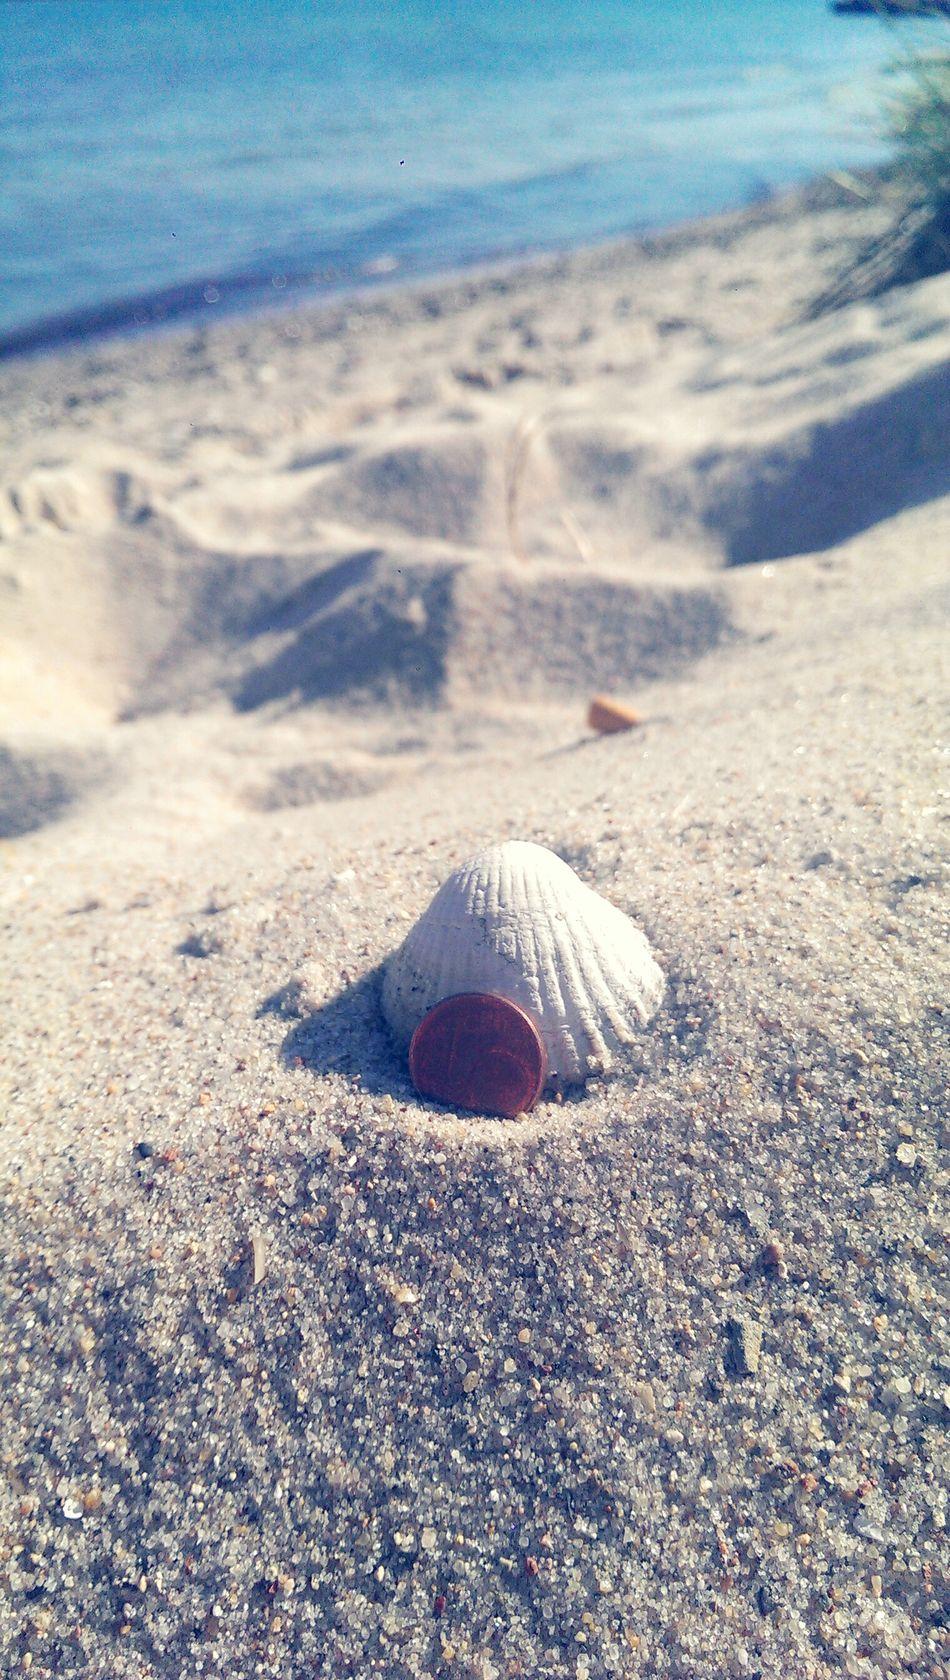 1Cent HTC_photography Enjoying The Sun Sunbathing Shell Sea And Sand Bla Bla